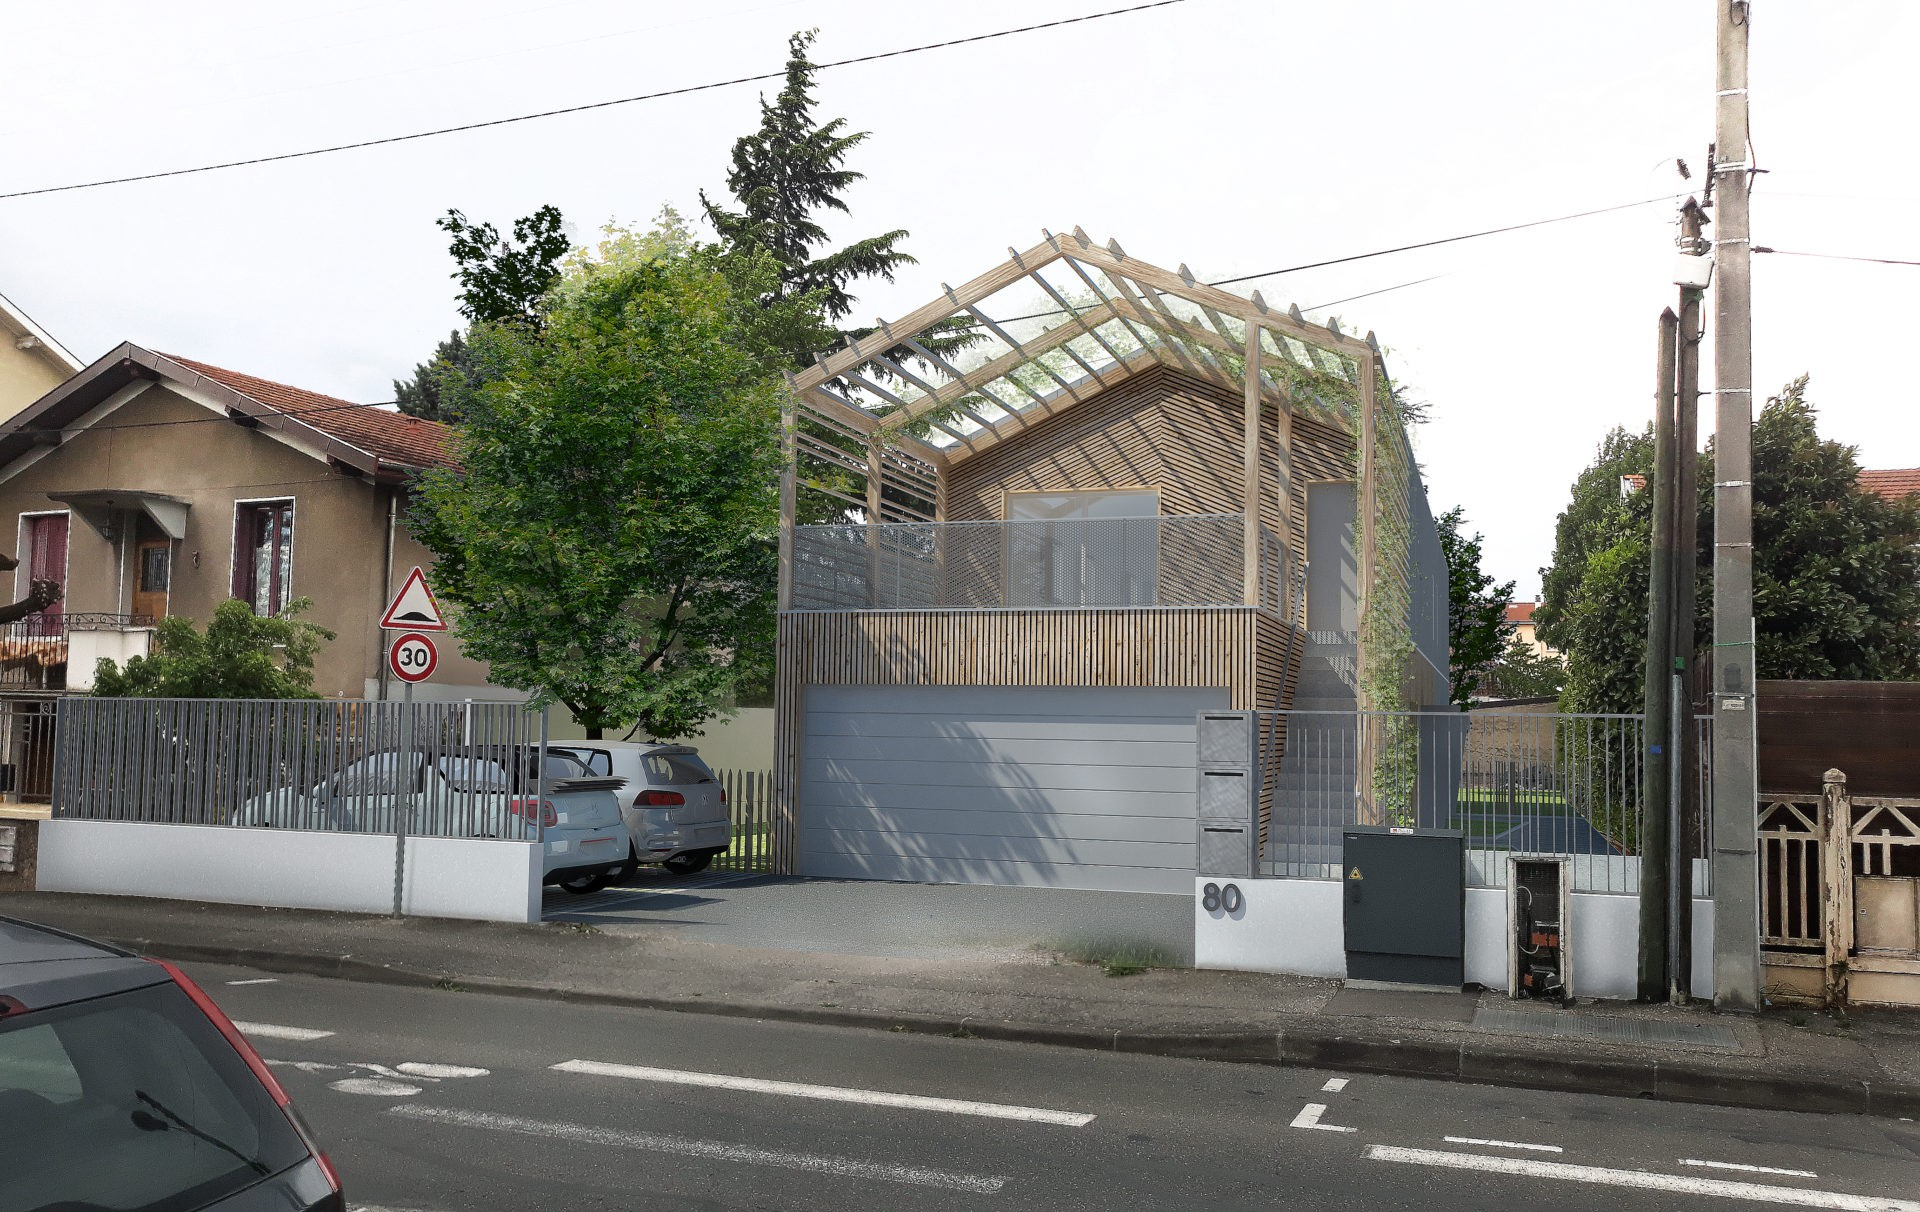 3 logements intermédiaires Bron Lyon métal bois habitat urbain 2